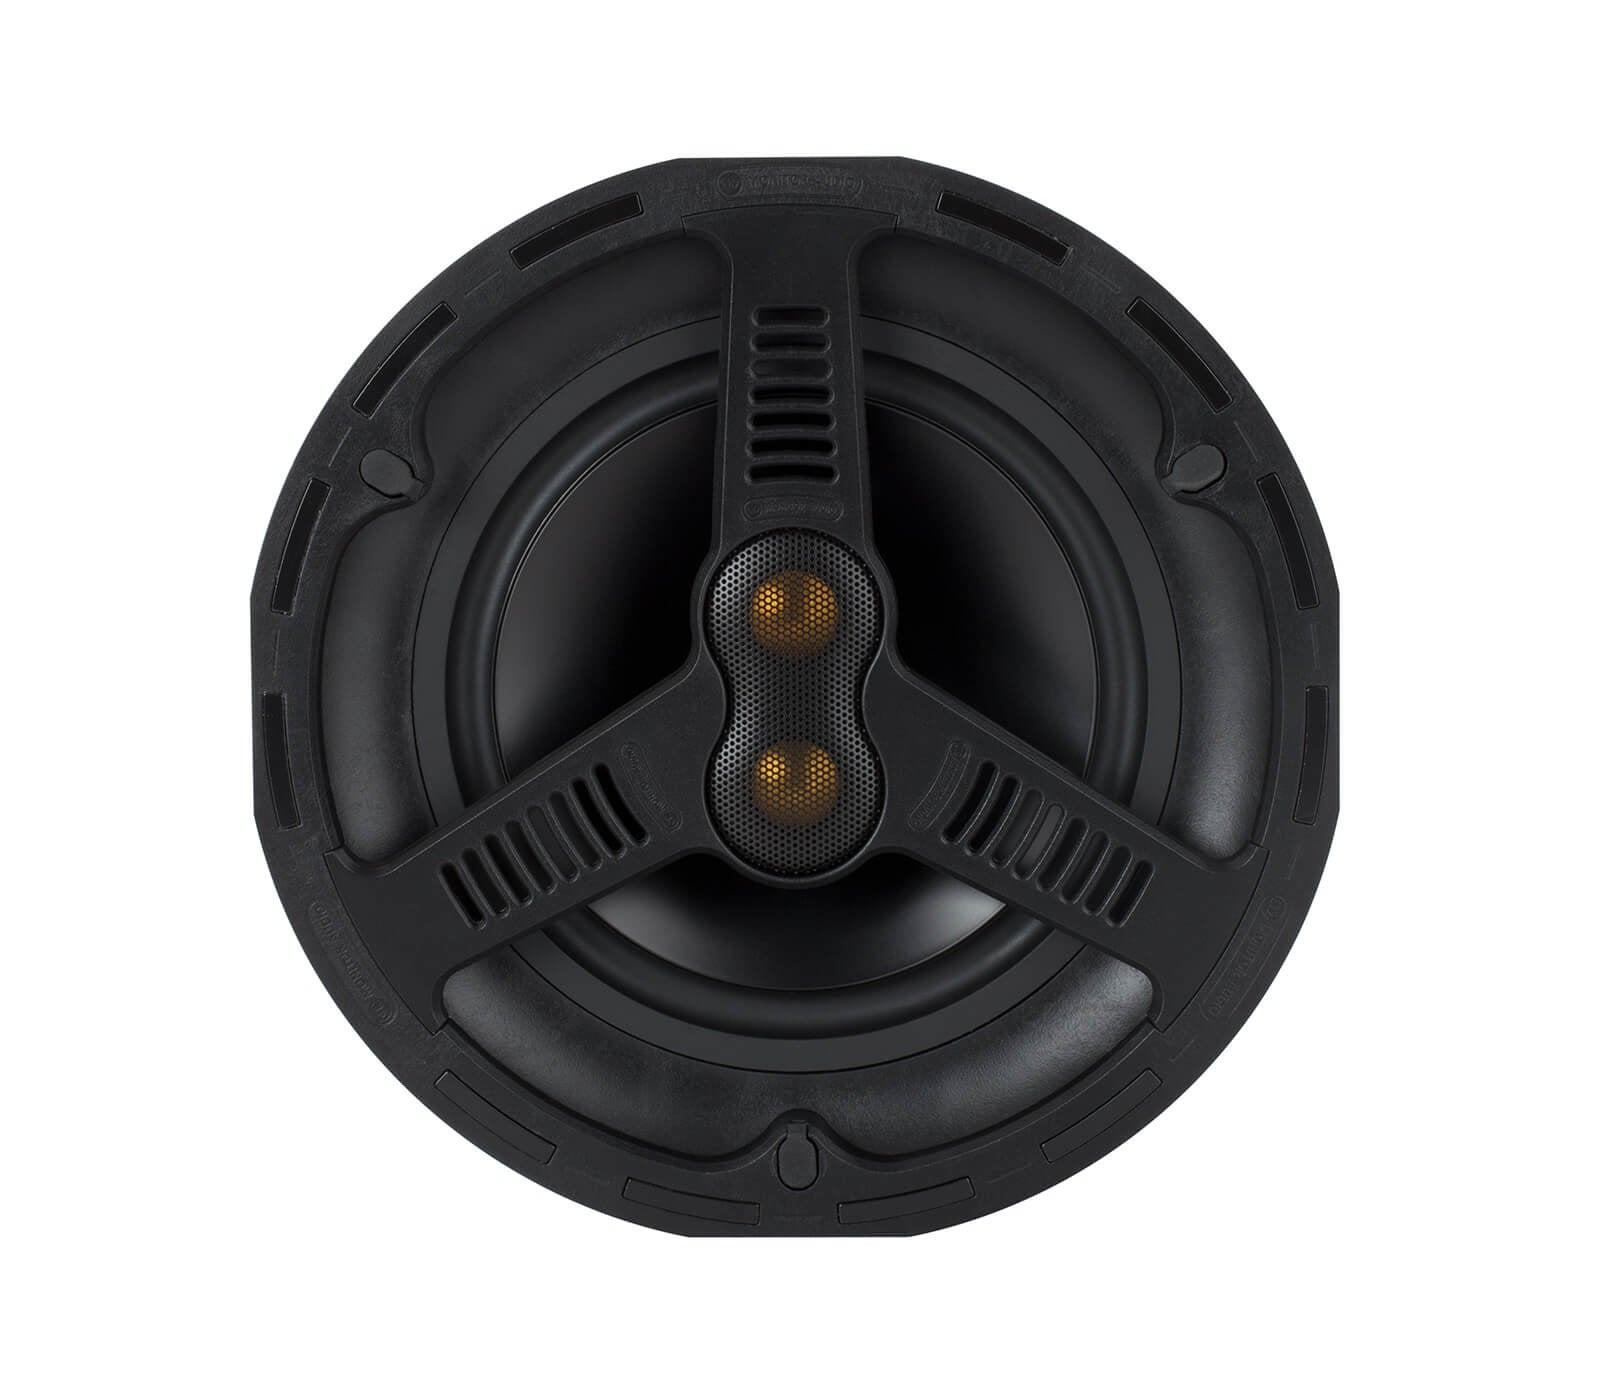 Monitor Audio AWC280-T2 Speaker